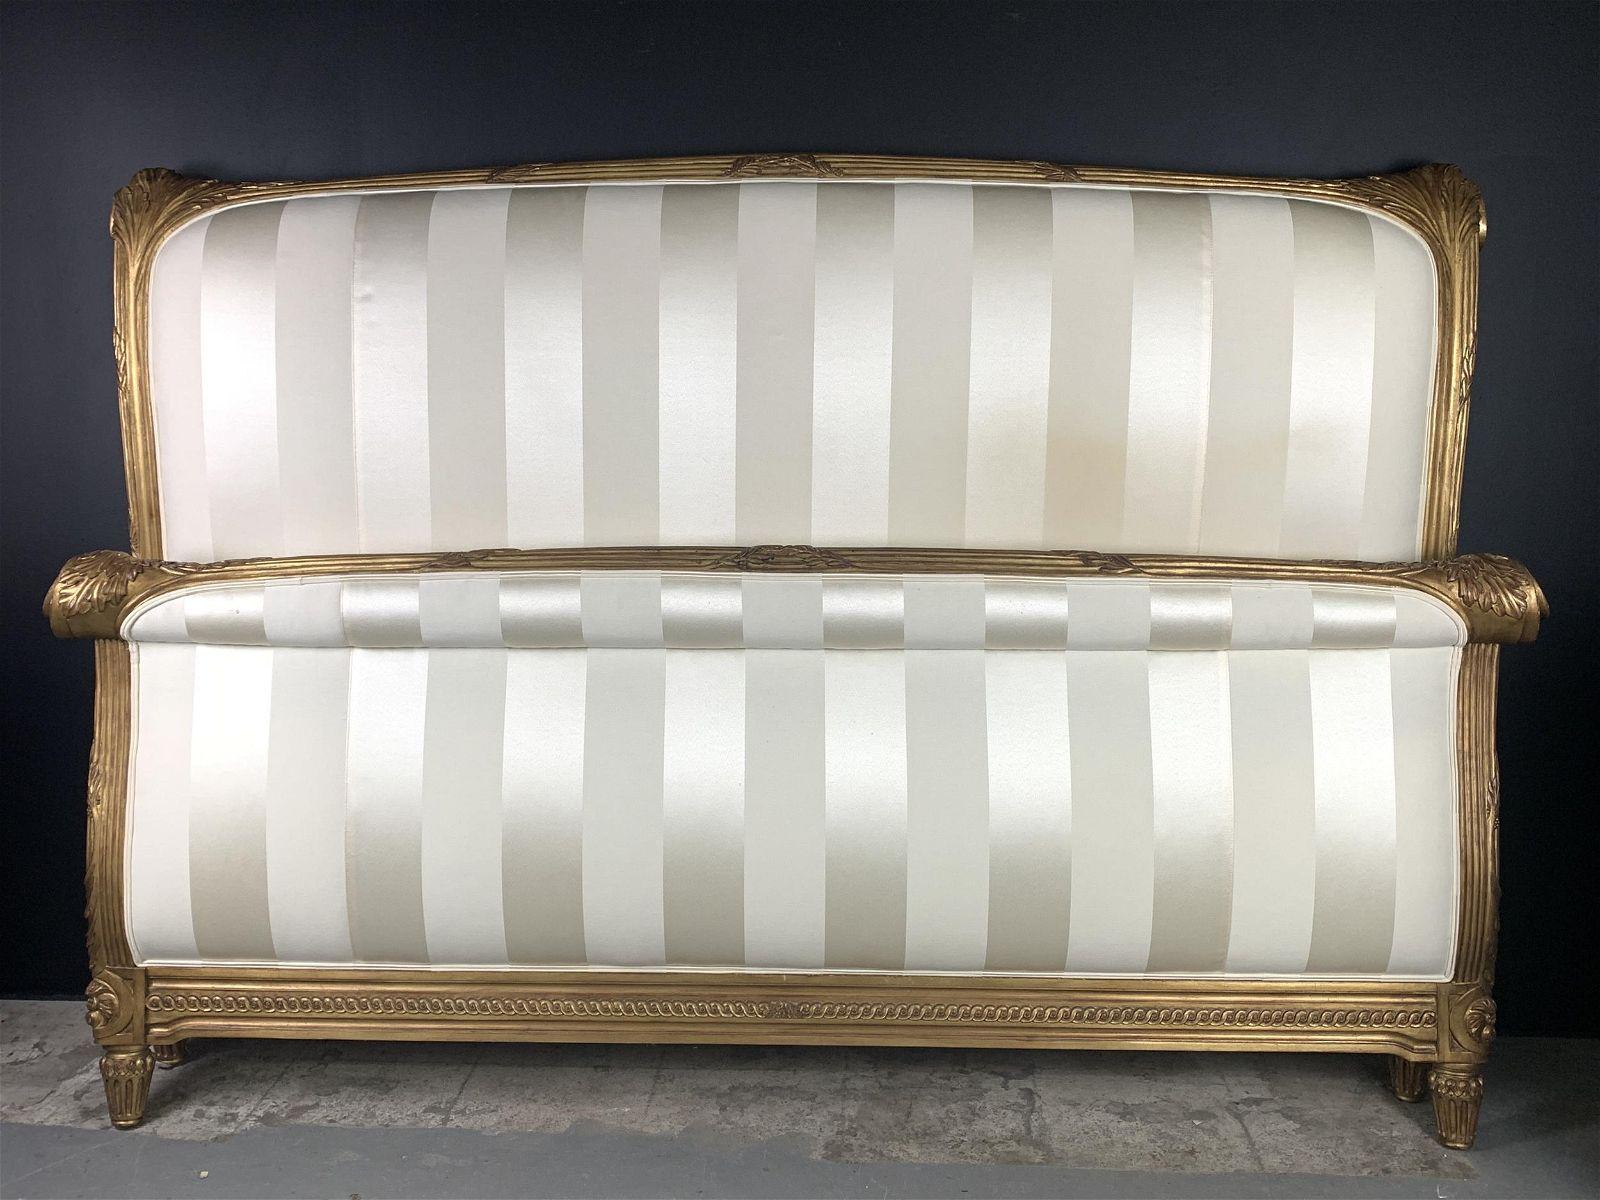 King Sized Carved Gilt Wood Upholstered Bed